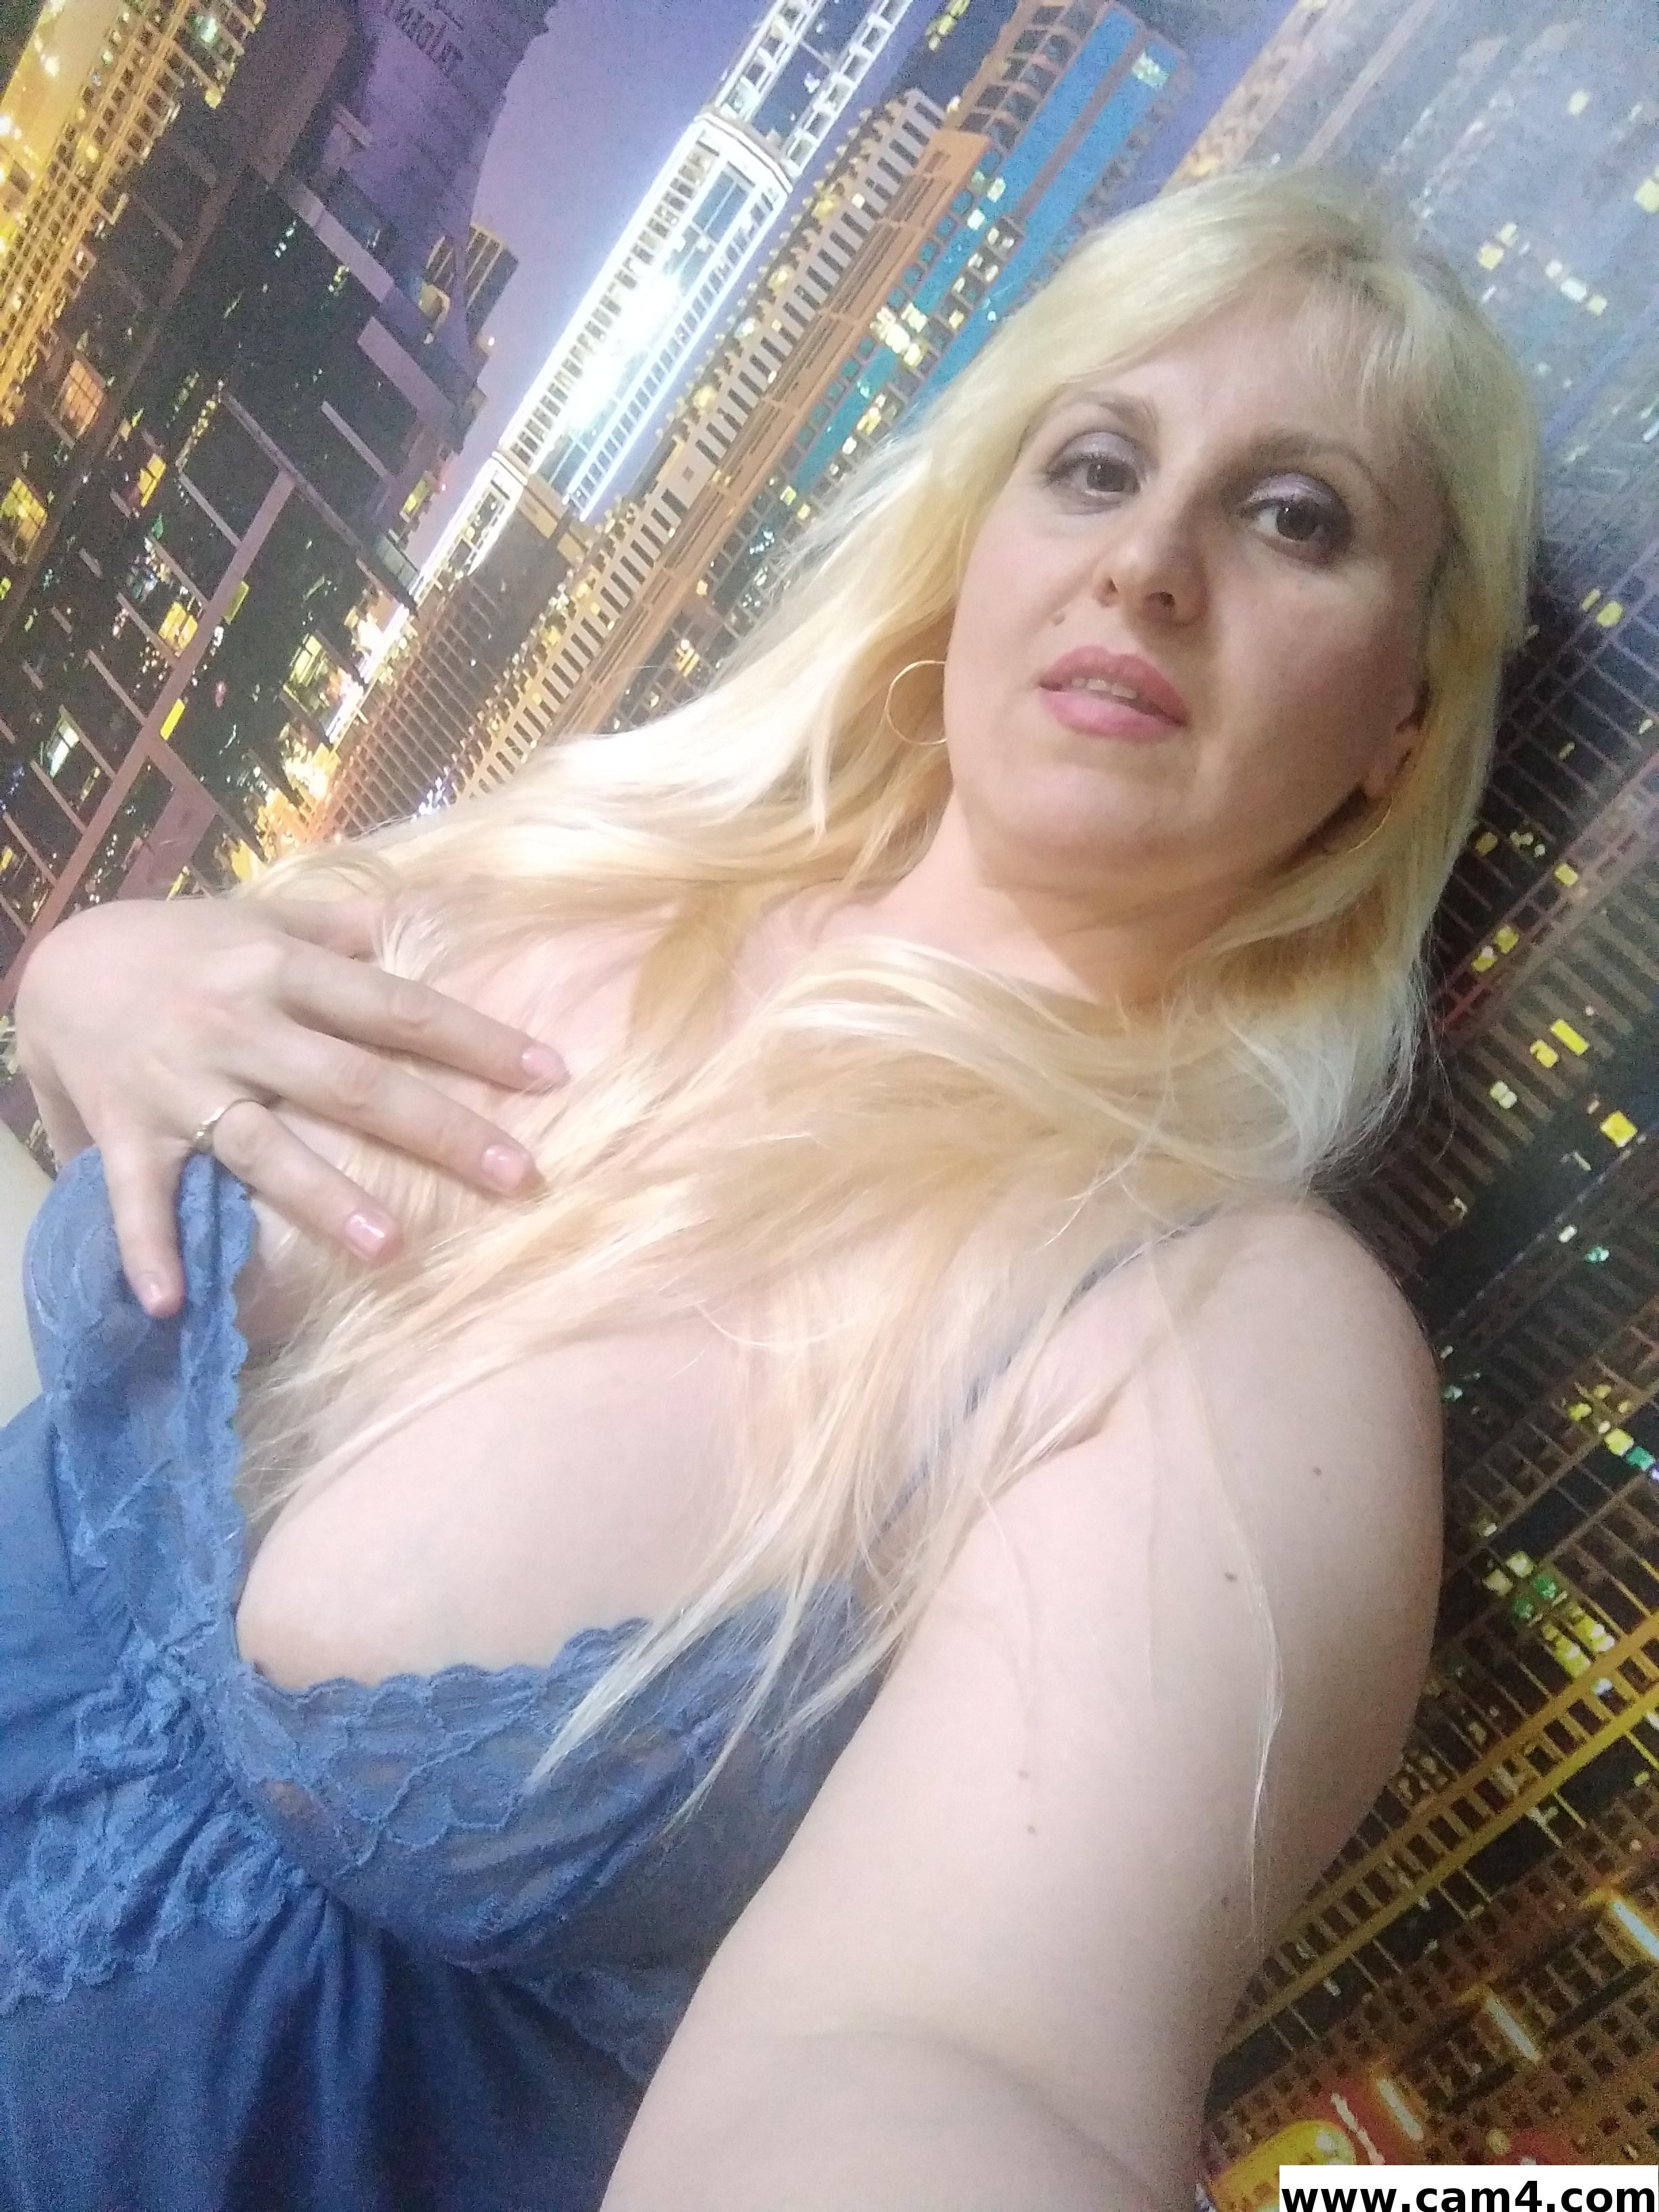 Blondabella?s=aygnw1kk9o3pjussutrytbimcquncgpxiqpi6bkgeno=